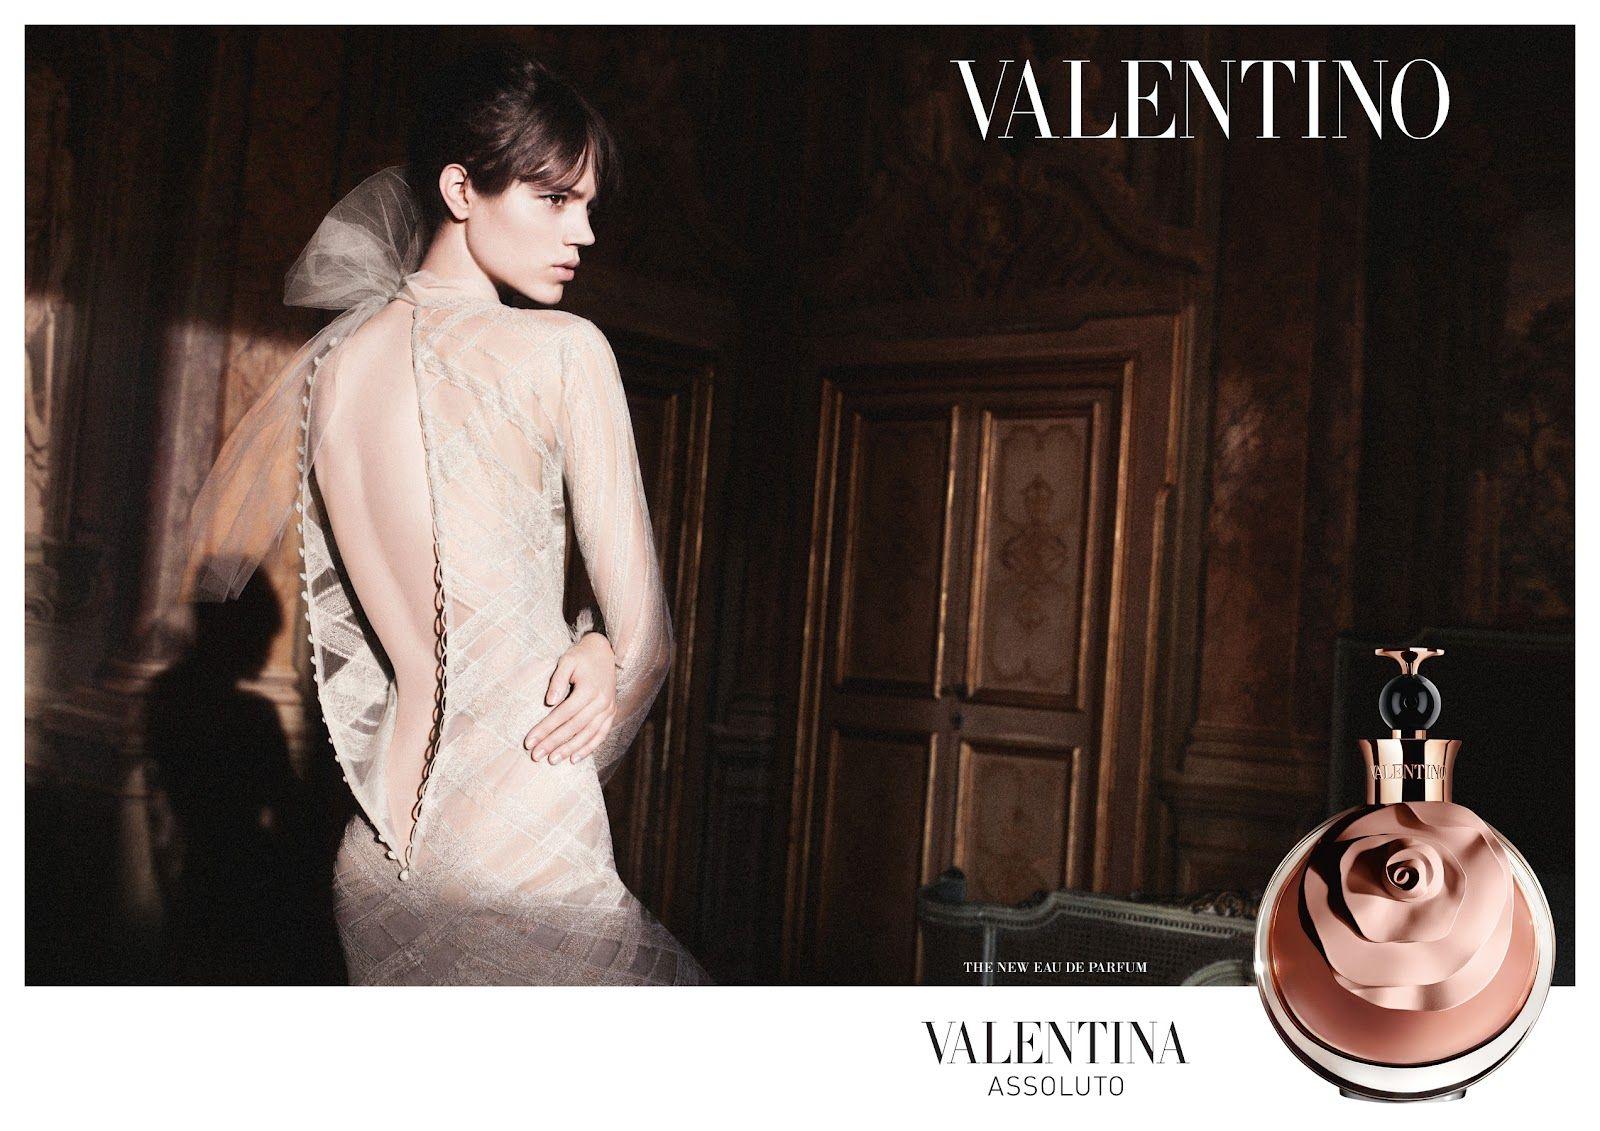 Review Valentino Valentina Assoluto | YouParfum | Valentino, Perfumes  femininos, Perfume